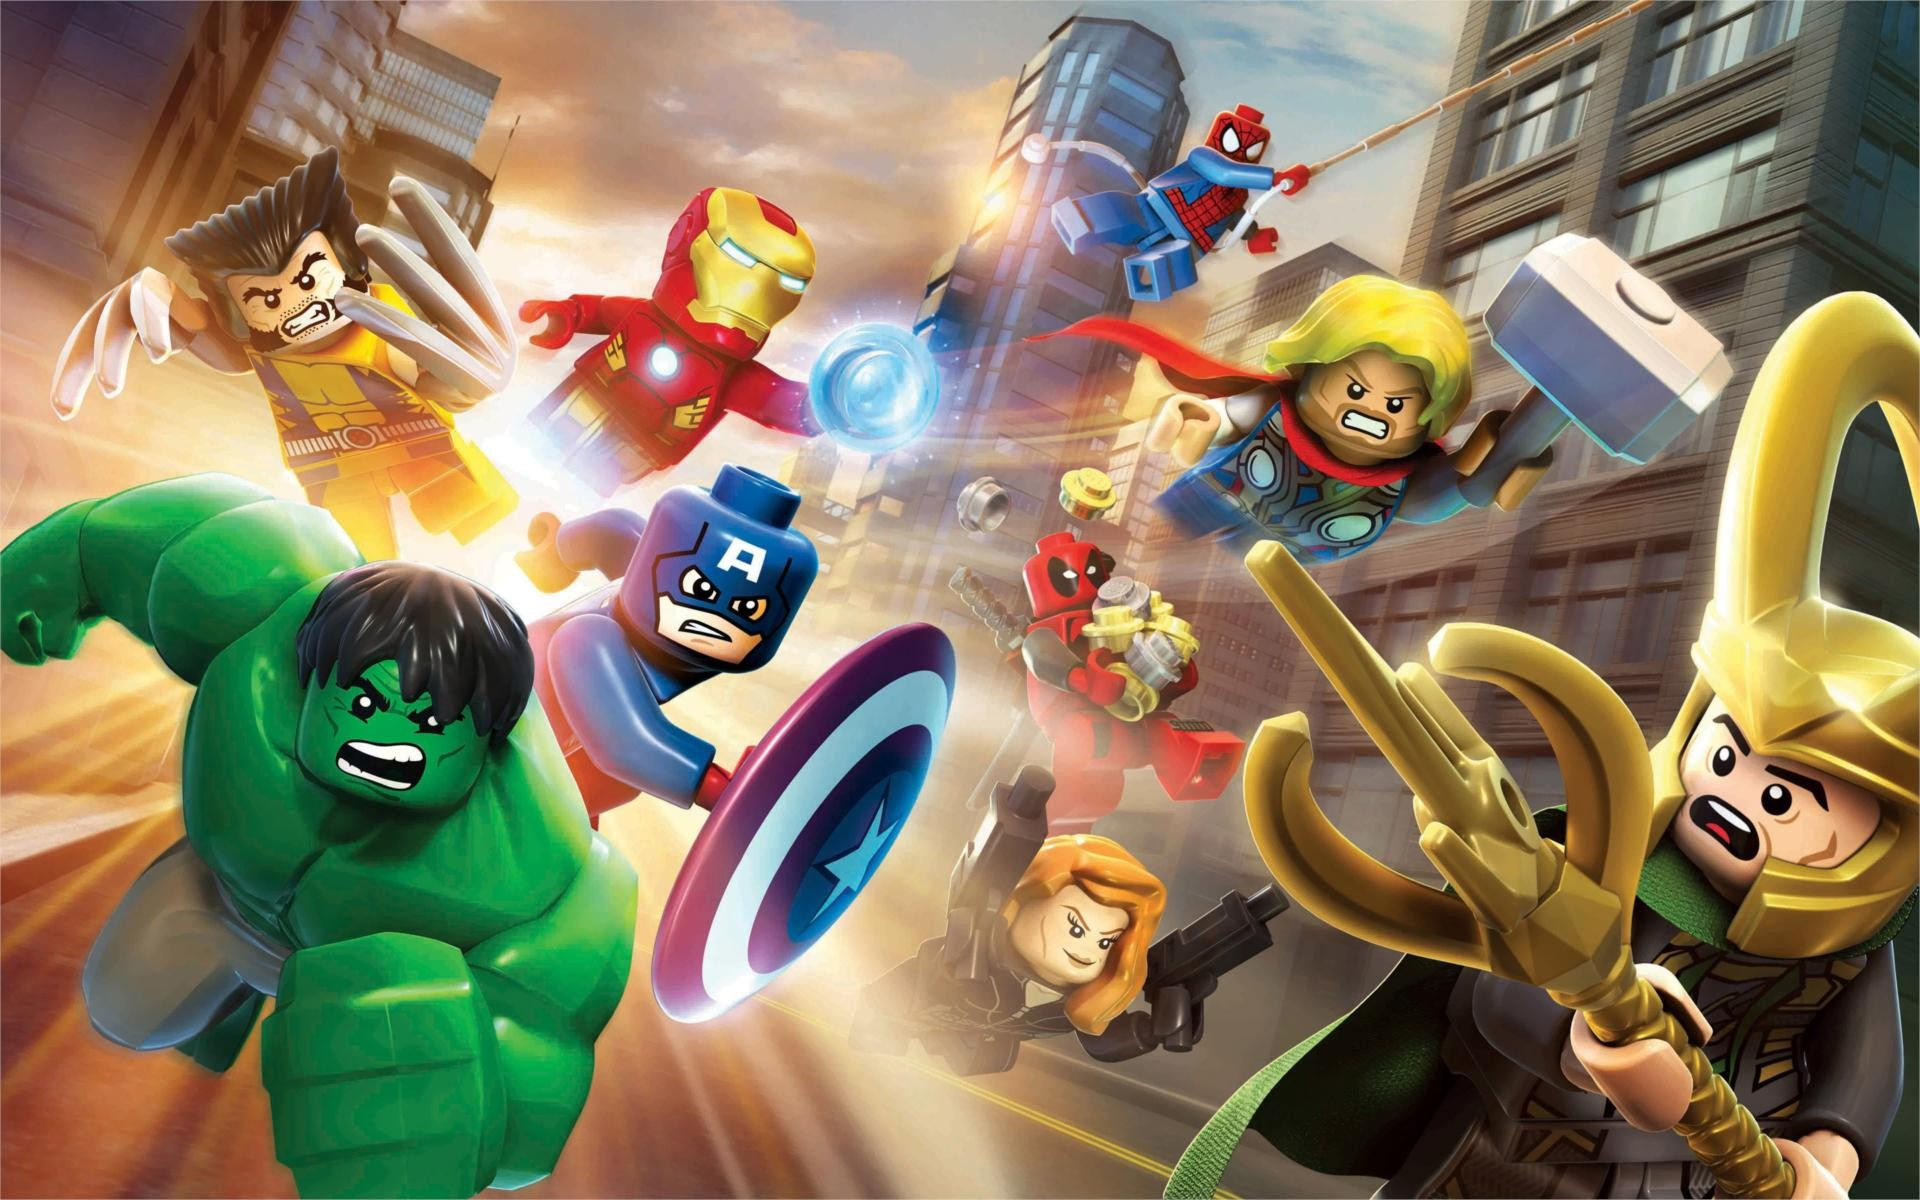 General 1920x1200 LEGO The Avengers Hulk Loki Iron Man Thor Wolverine Spider-Man Captain America Black Widow Deadpool